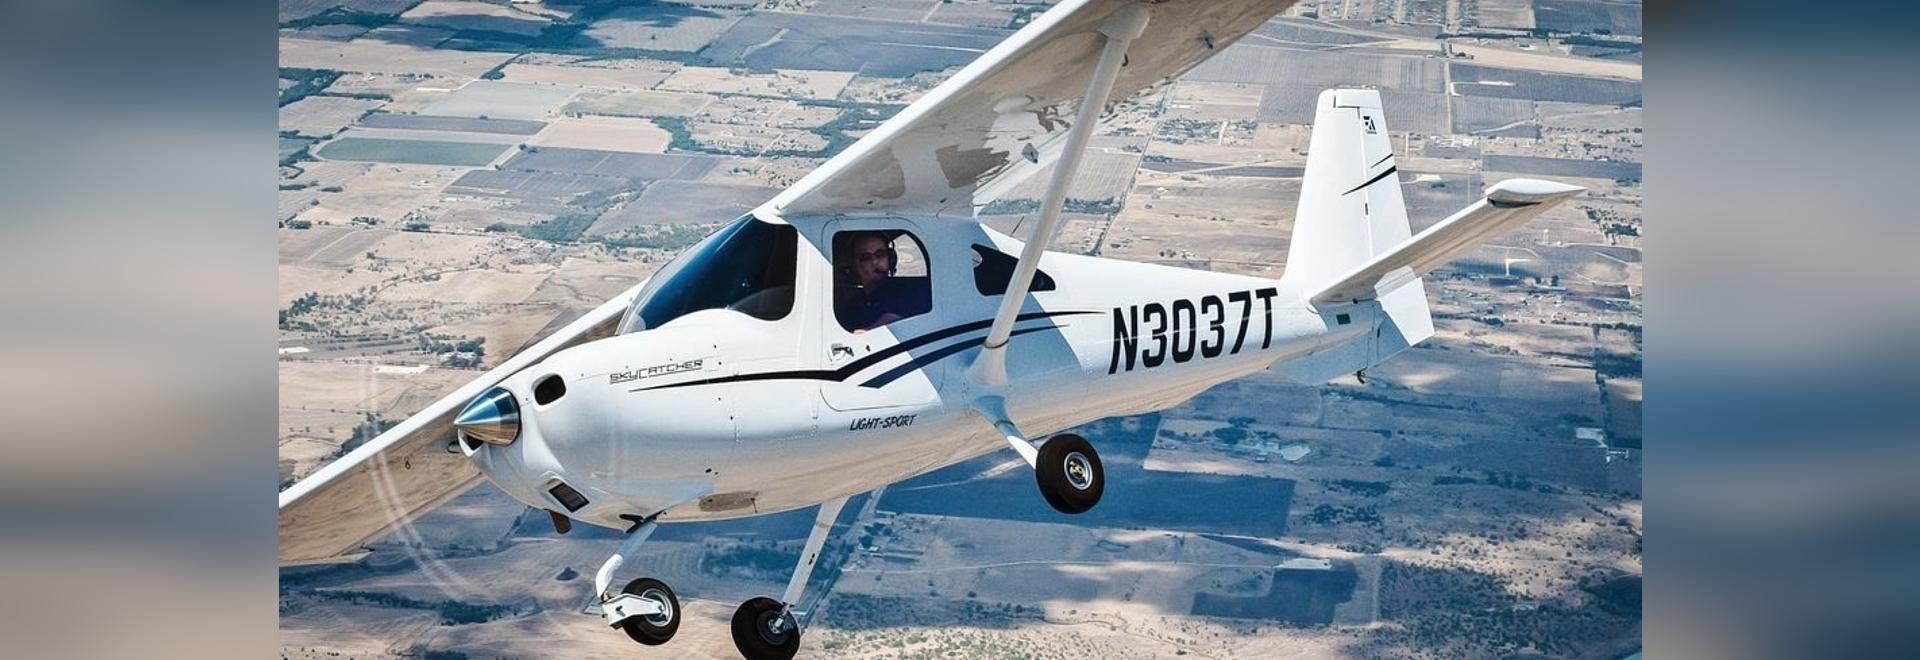 The Skycatcher responds readily to pilot input, making it fun to maneuver.